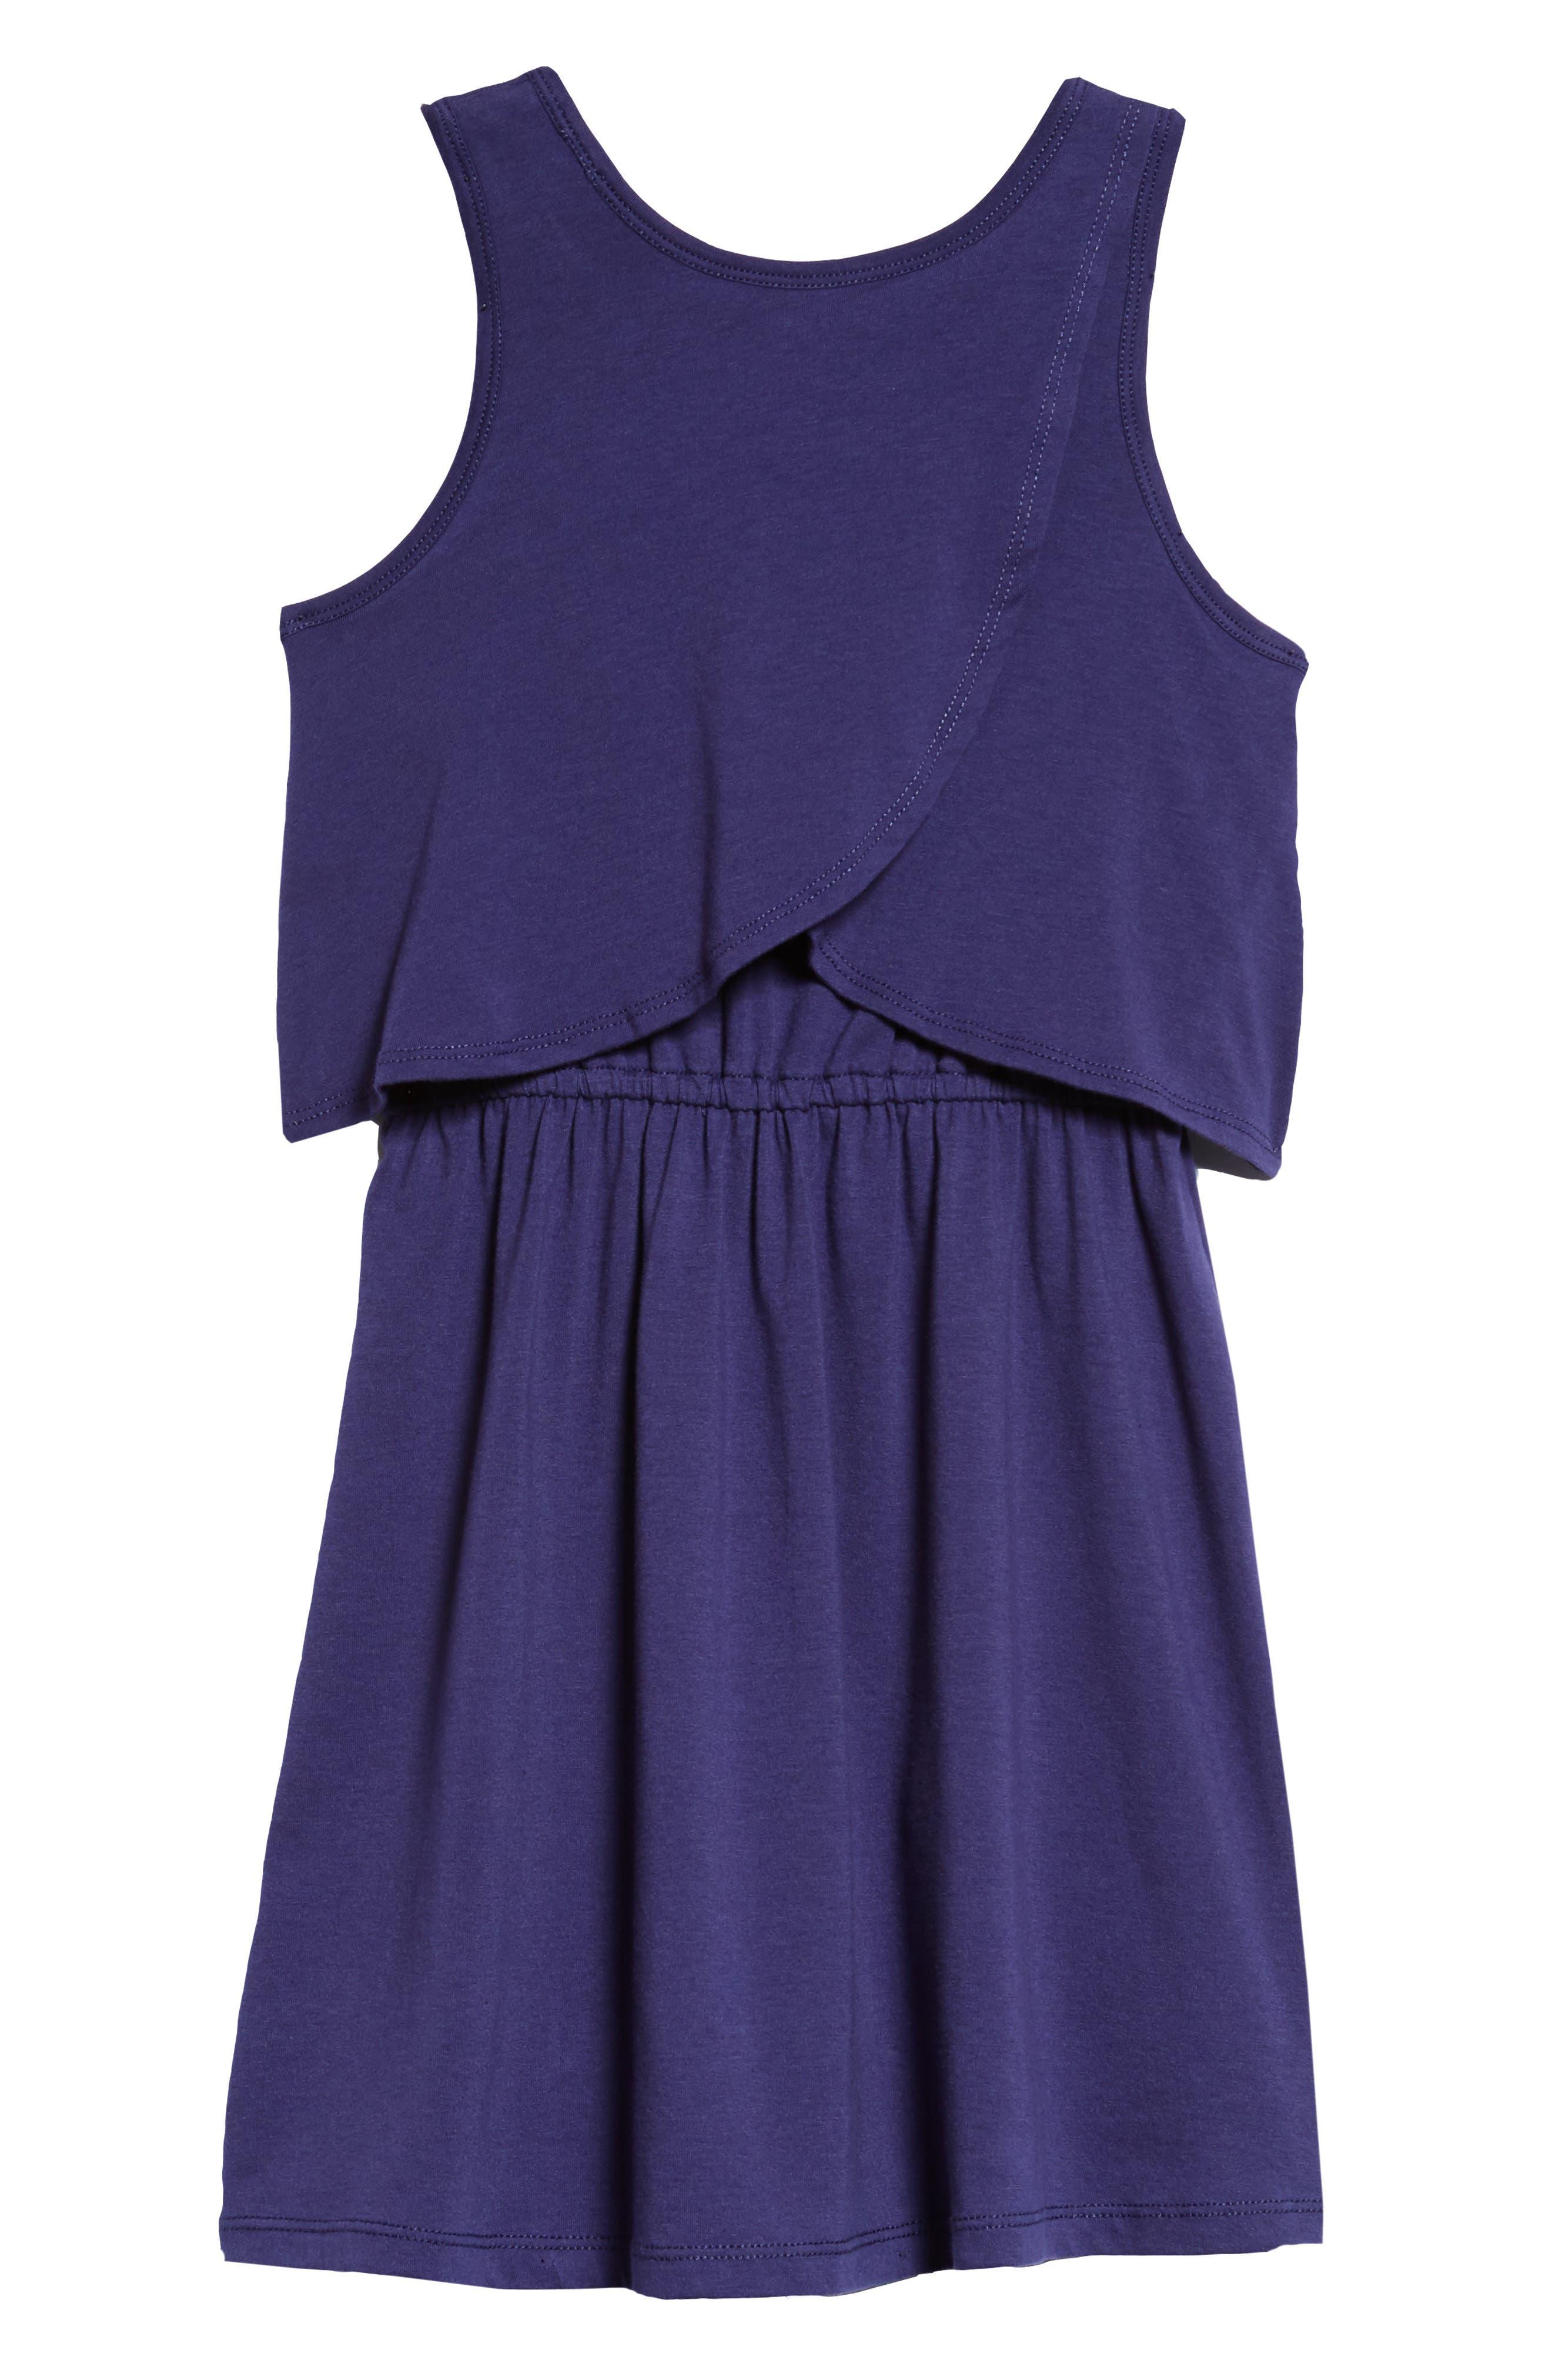 Popover Knit Tank Dress,                             Alternate thumbnail 2, color,                             Navy Ribbon